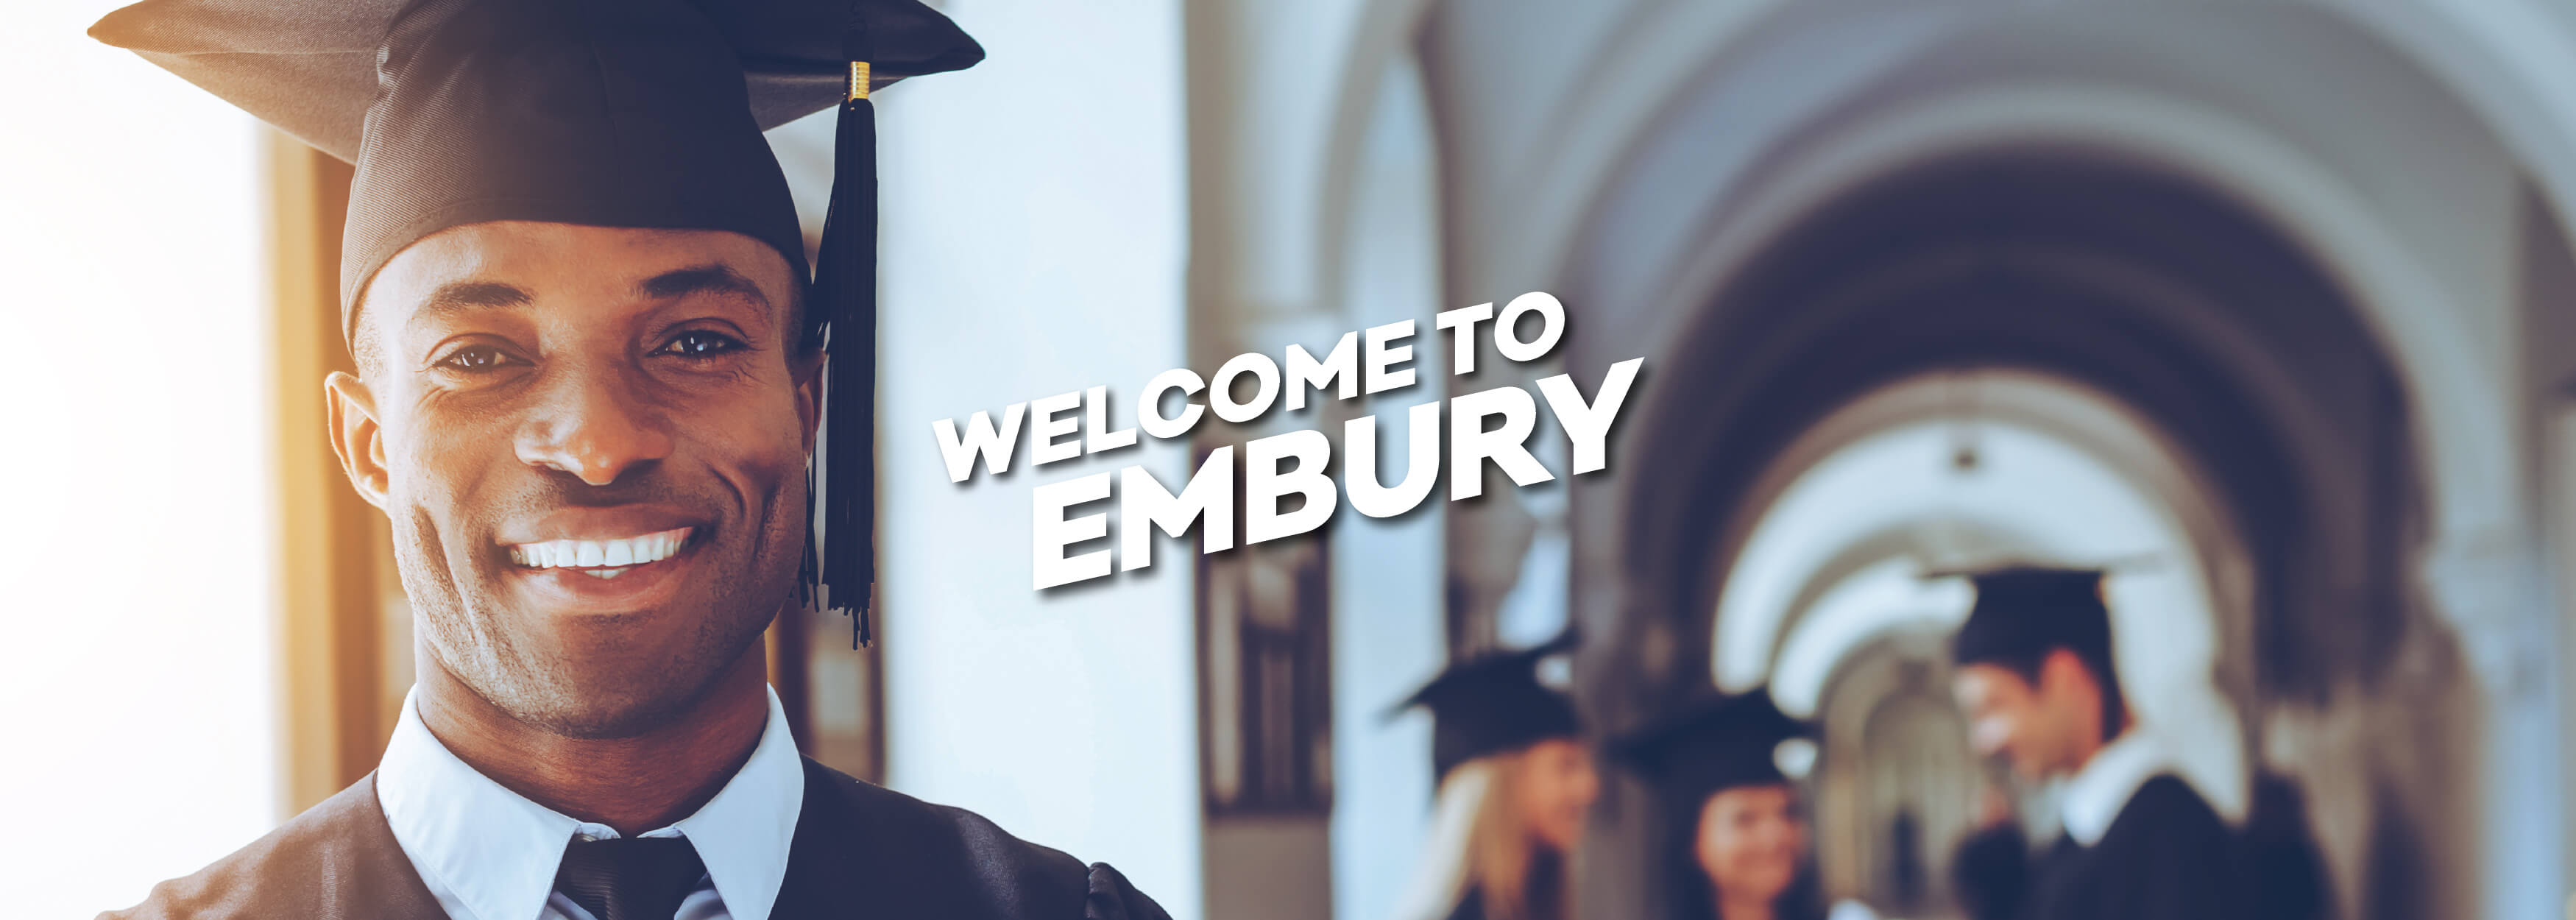 Teaching Courses, Certificates, Diplomas and Degrees - Embury